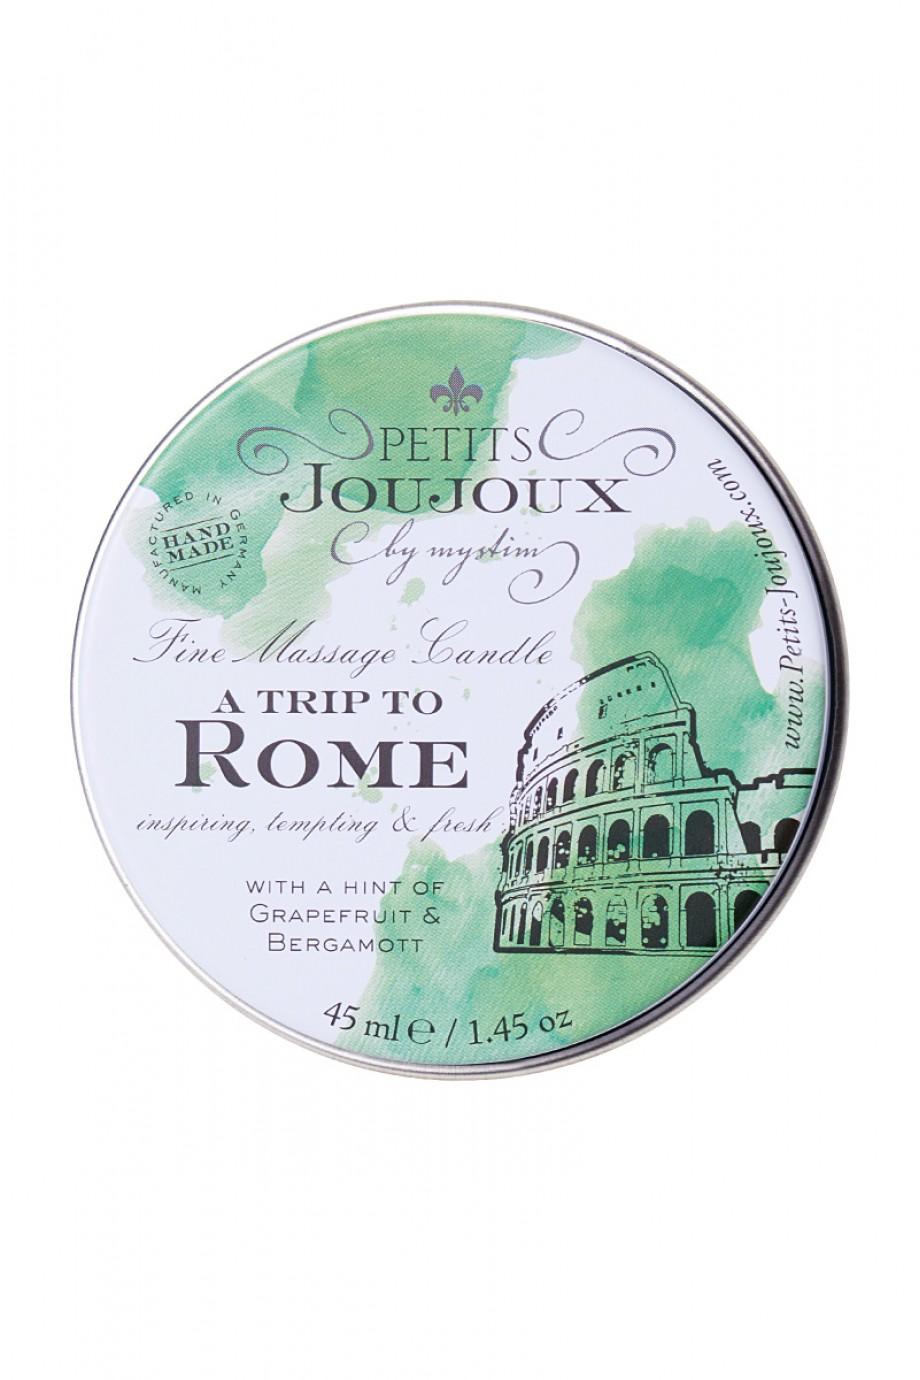 Массажная свеча Petits JouJoux Mini Rome с ароматом грейпфрута и бергамота, 43 мл